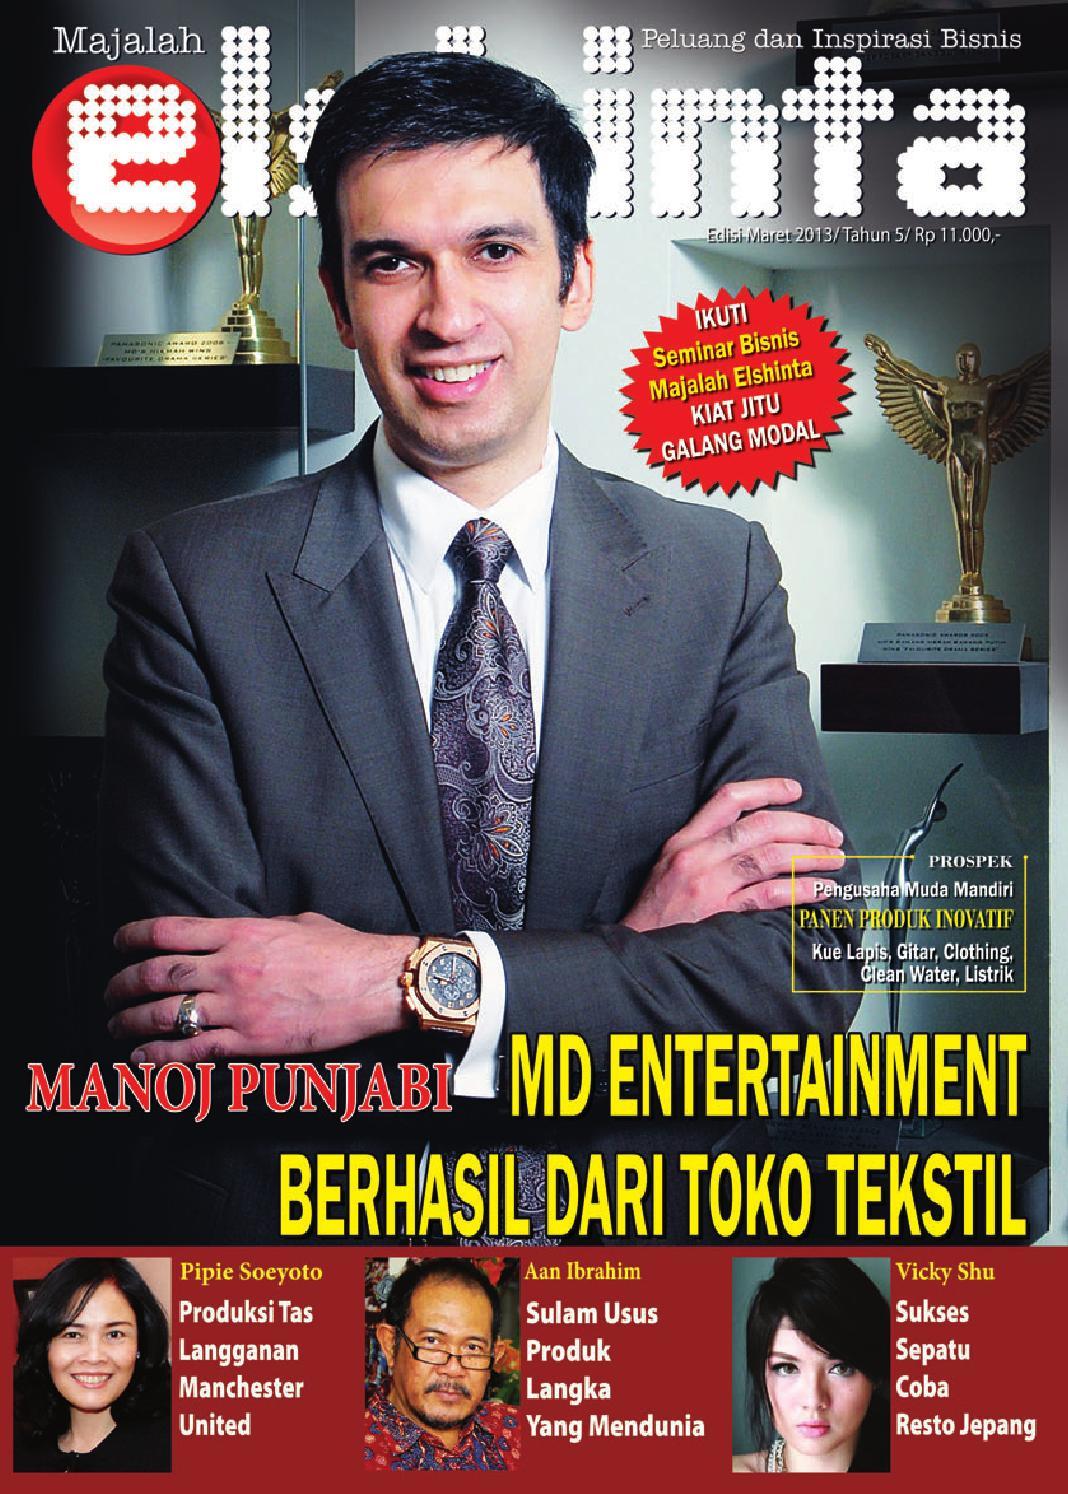 Majalah Elshinta Edisi Maret 2013 By Niko Areasto Issuu Produk Ukm Bumn Sutra Super